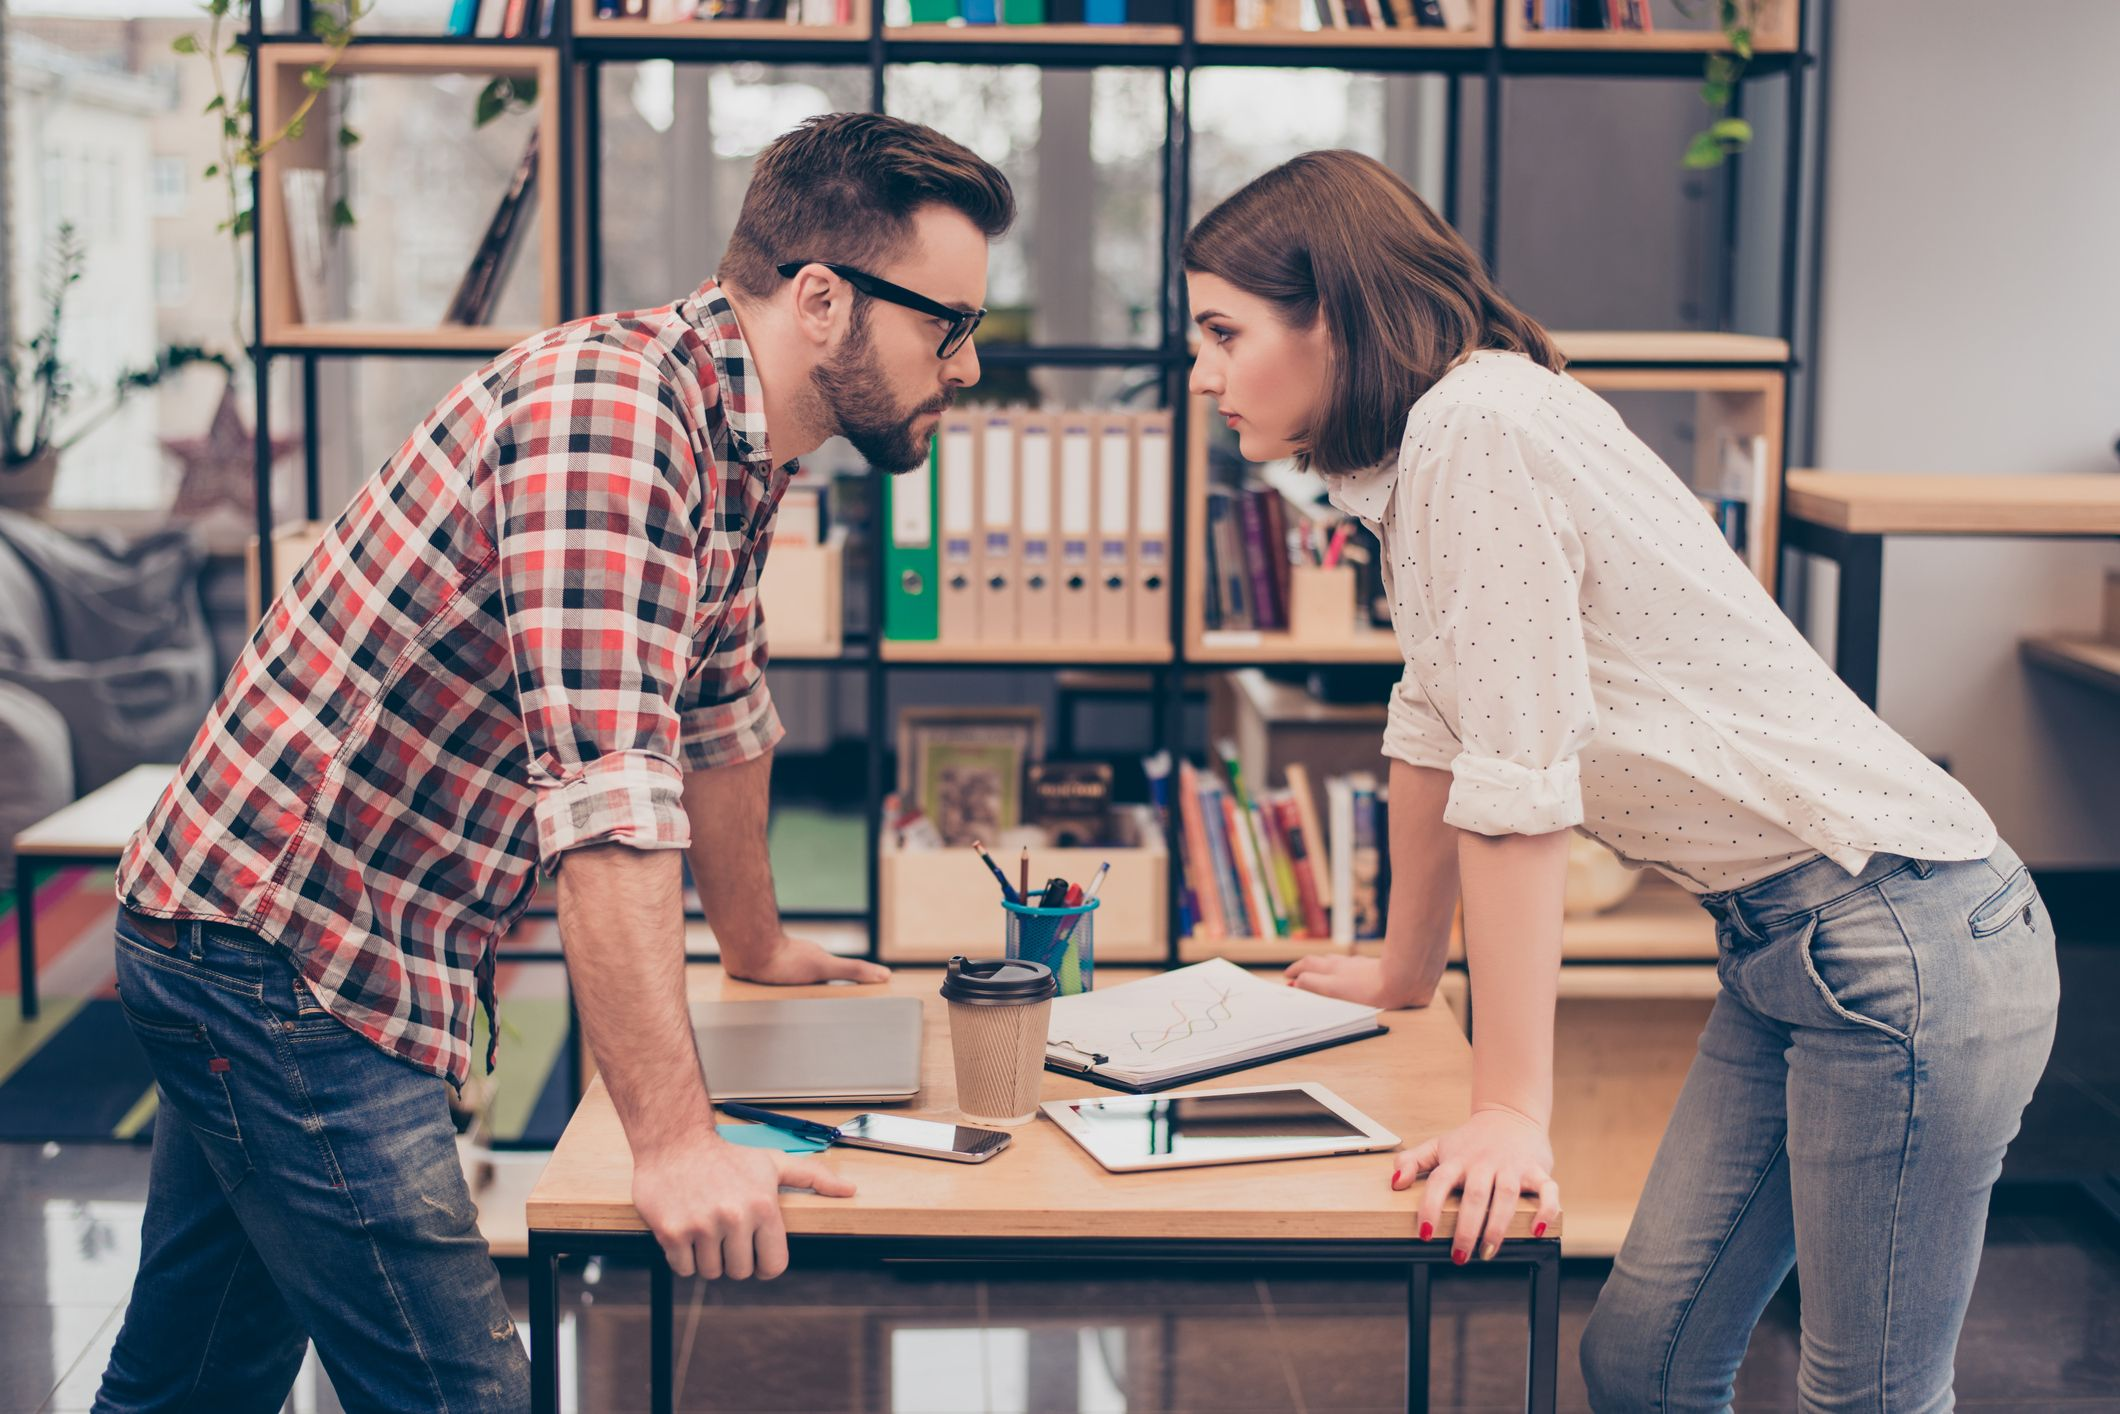 Conflict and quarreling created through blame